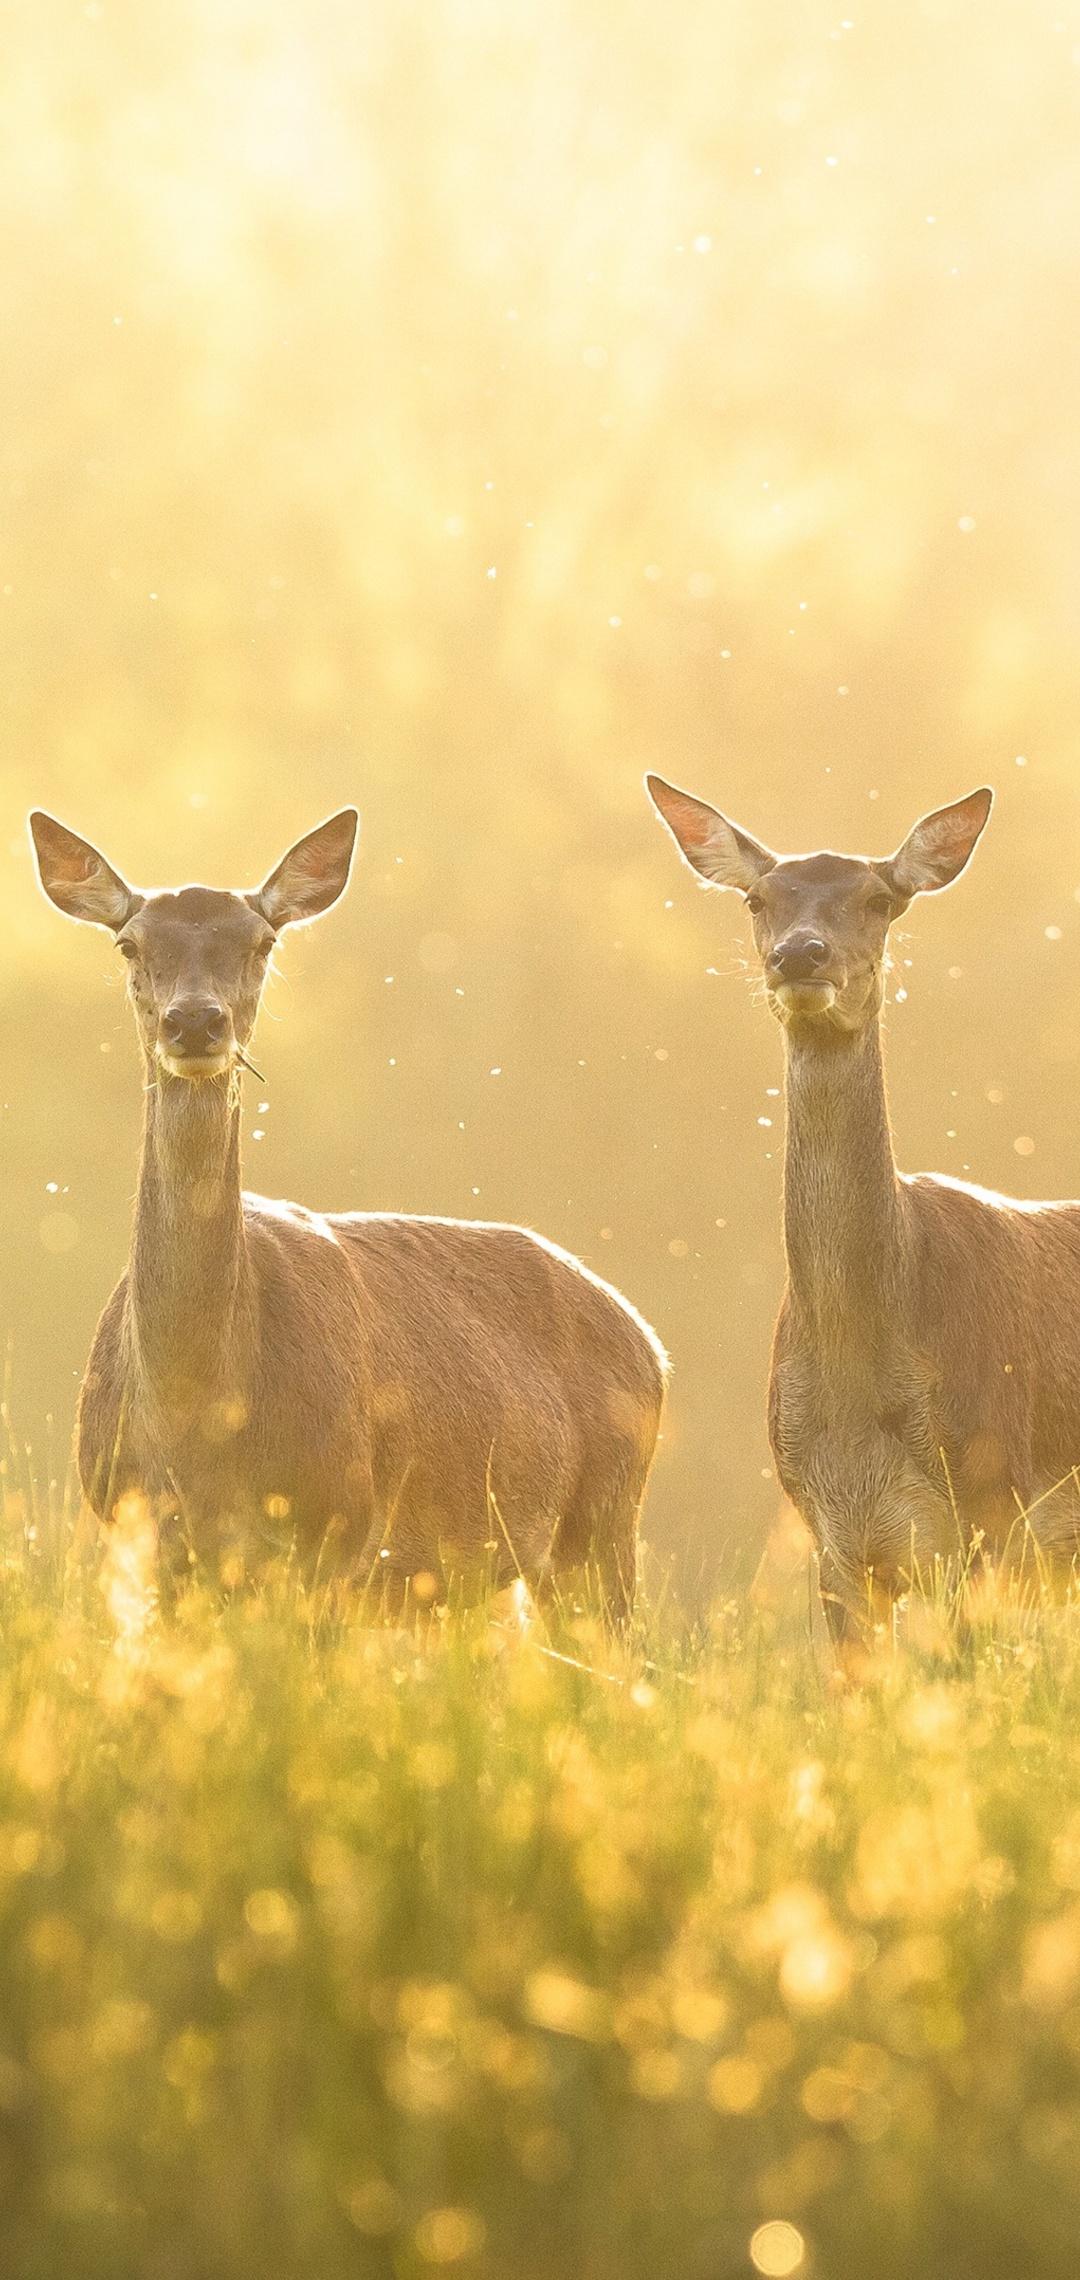 deer-grass-4k-3i.jpg